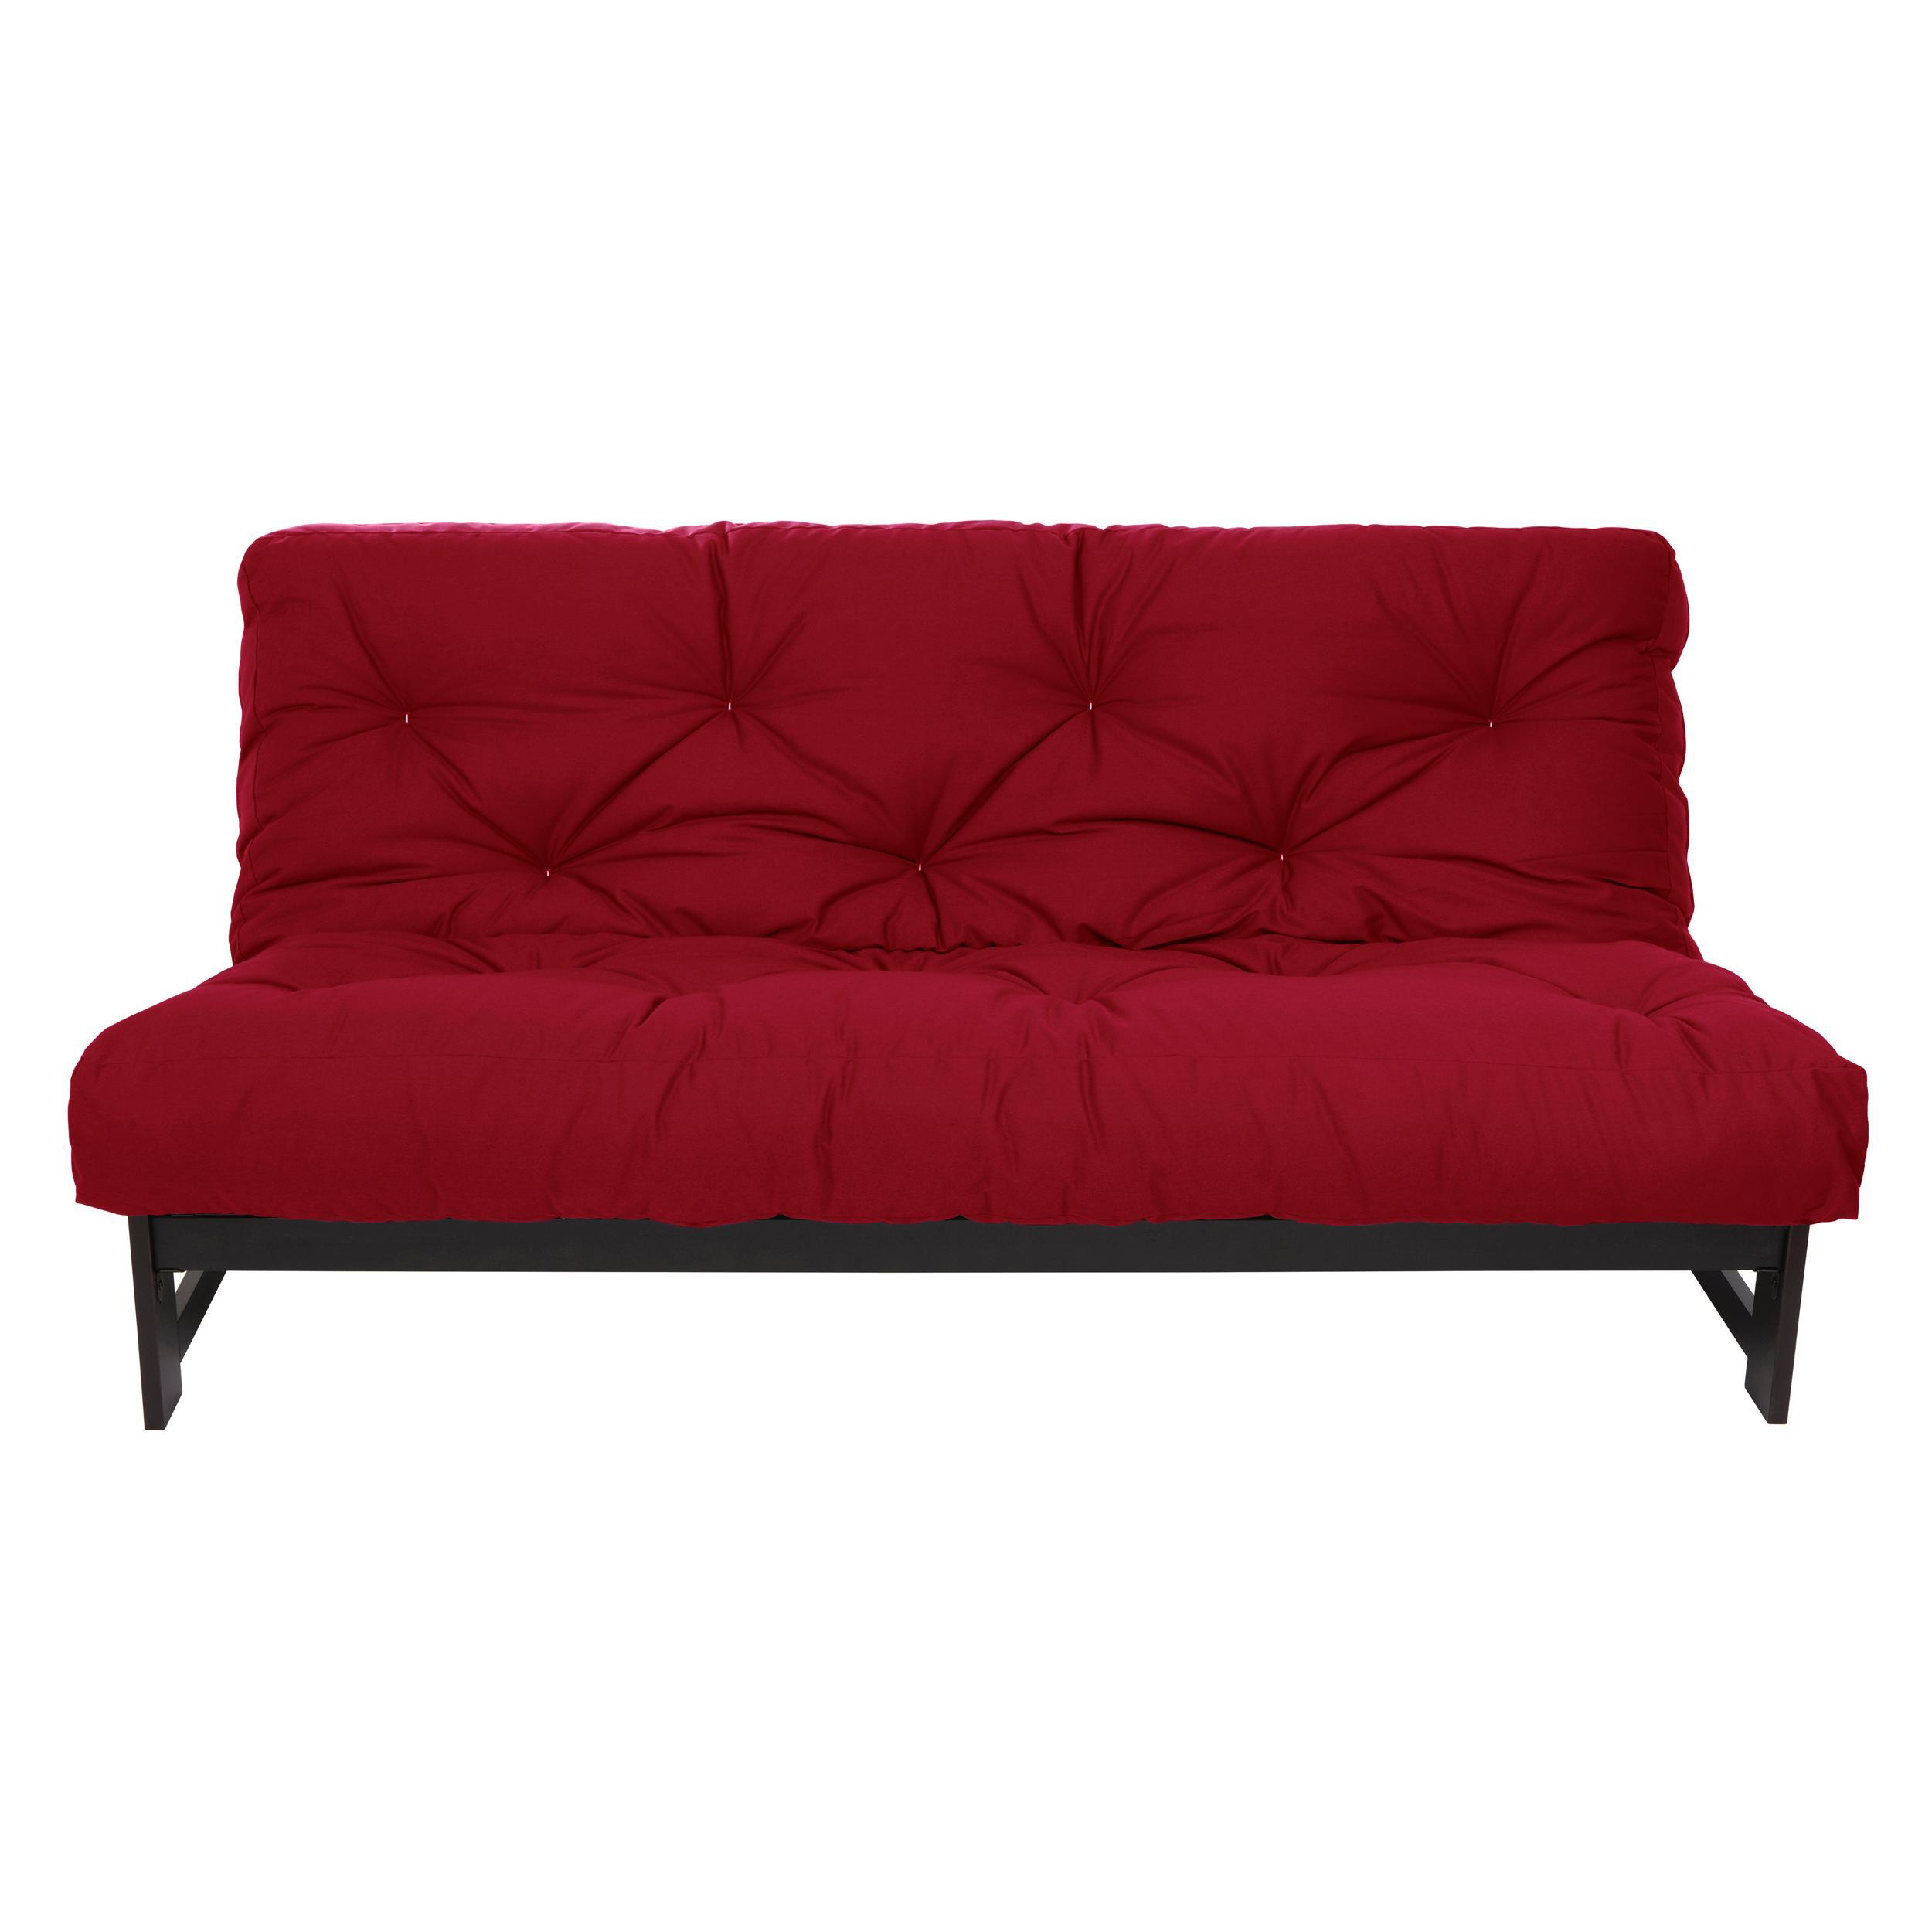 mozaic queen size 10 inch futon mattress red. Black Bedroom Furniture Sets. Home Design Ideas